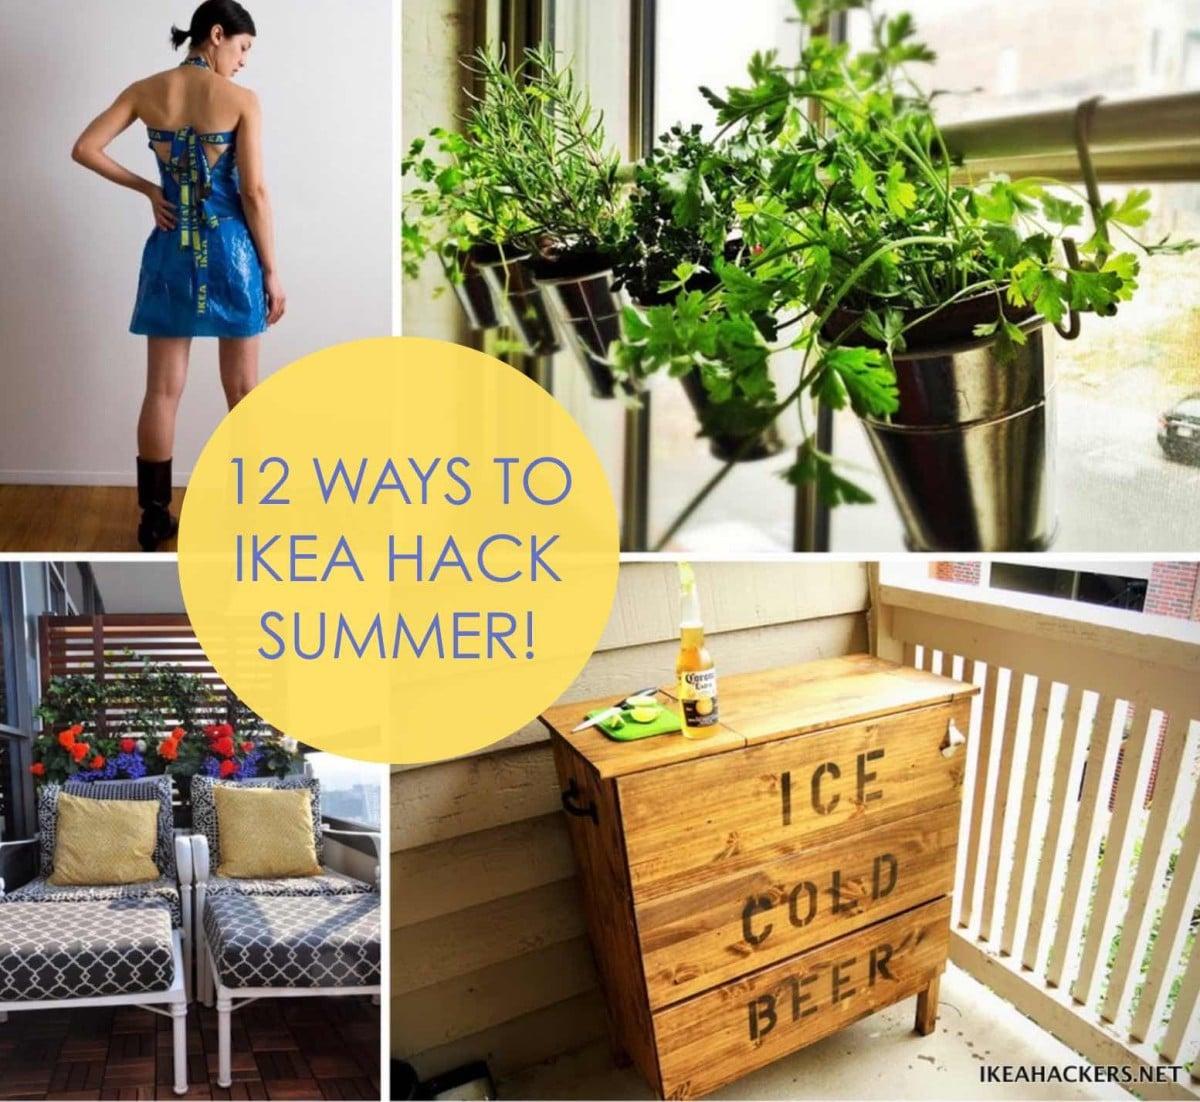 12 Ways To Ikea Hack Summer Hackers